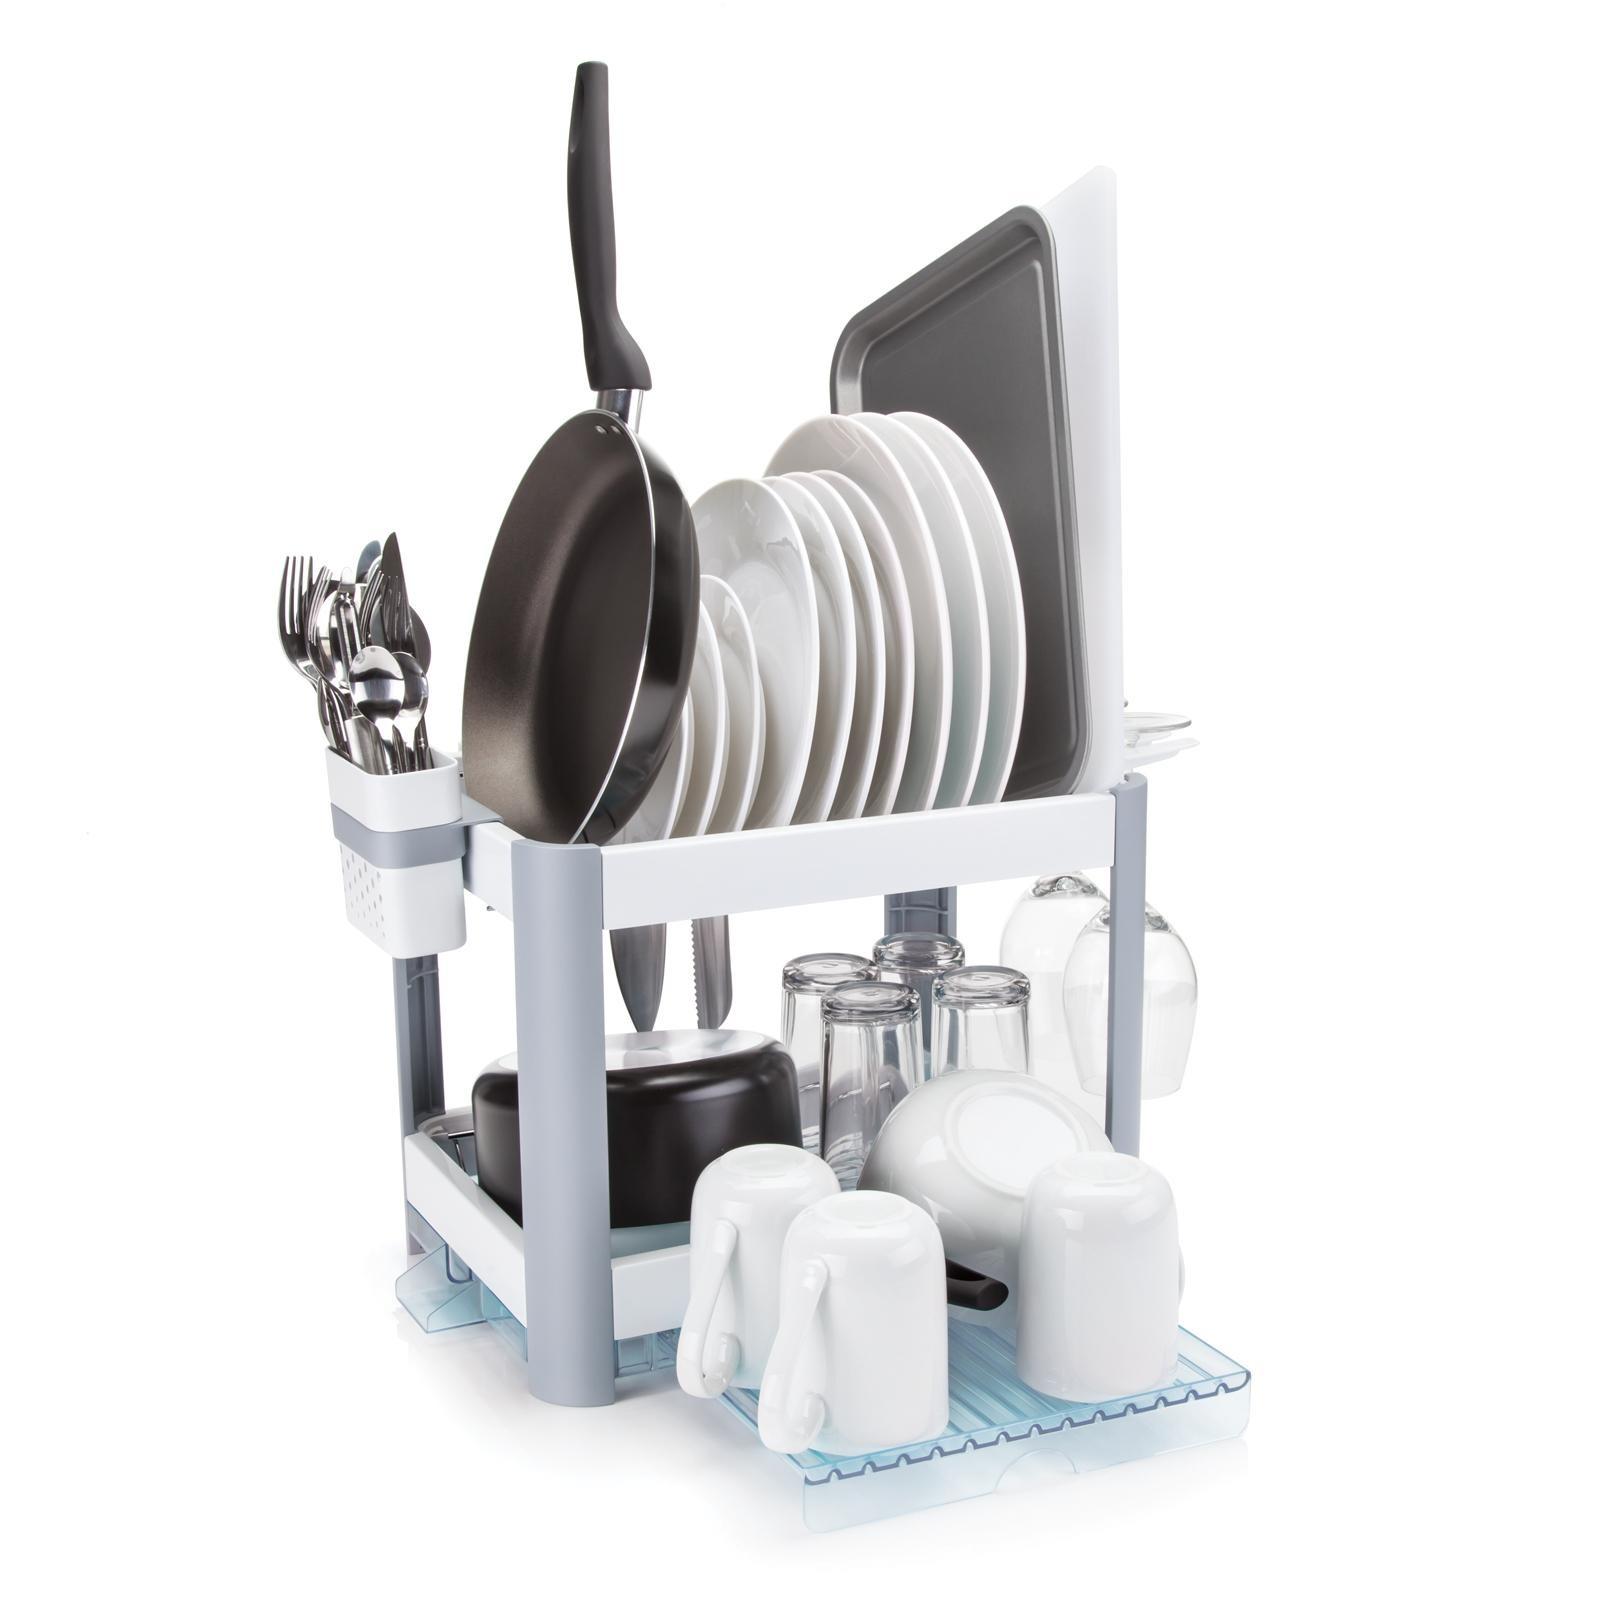 Minky Homecare Minky Twin Tier Extending Dish Drying Rack